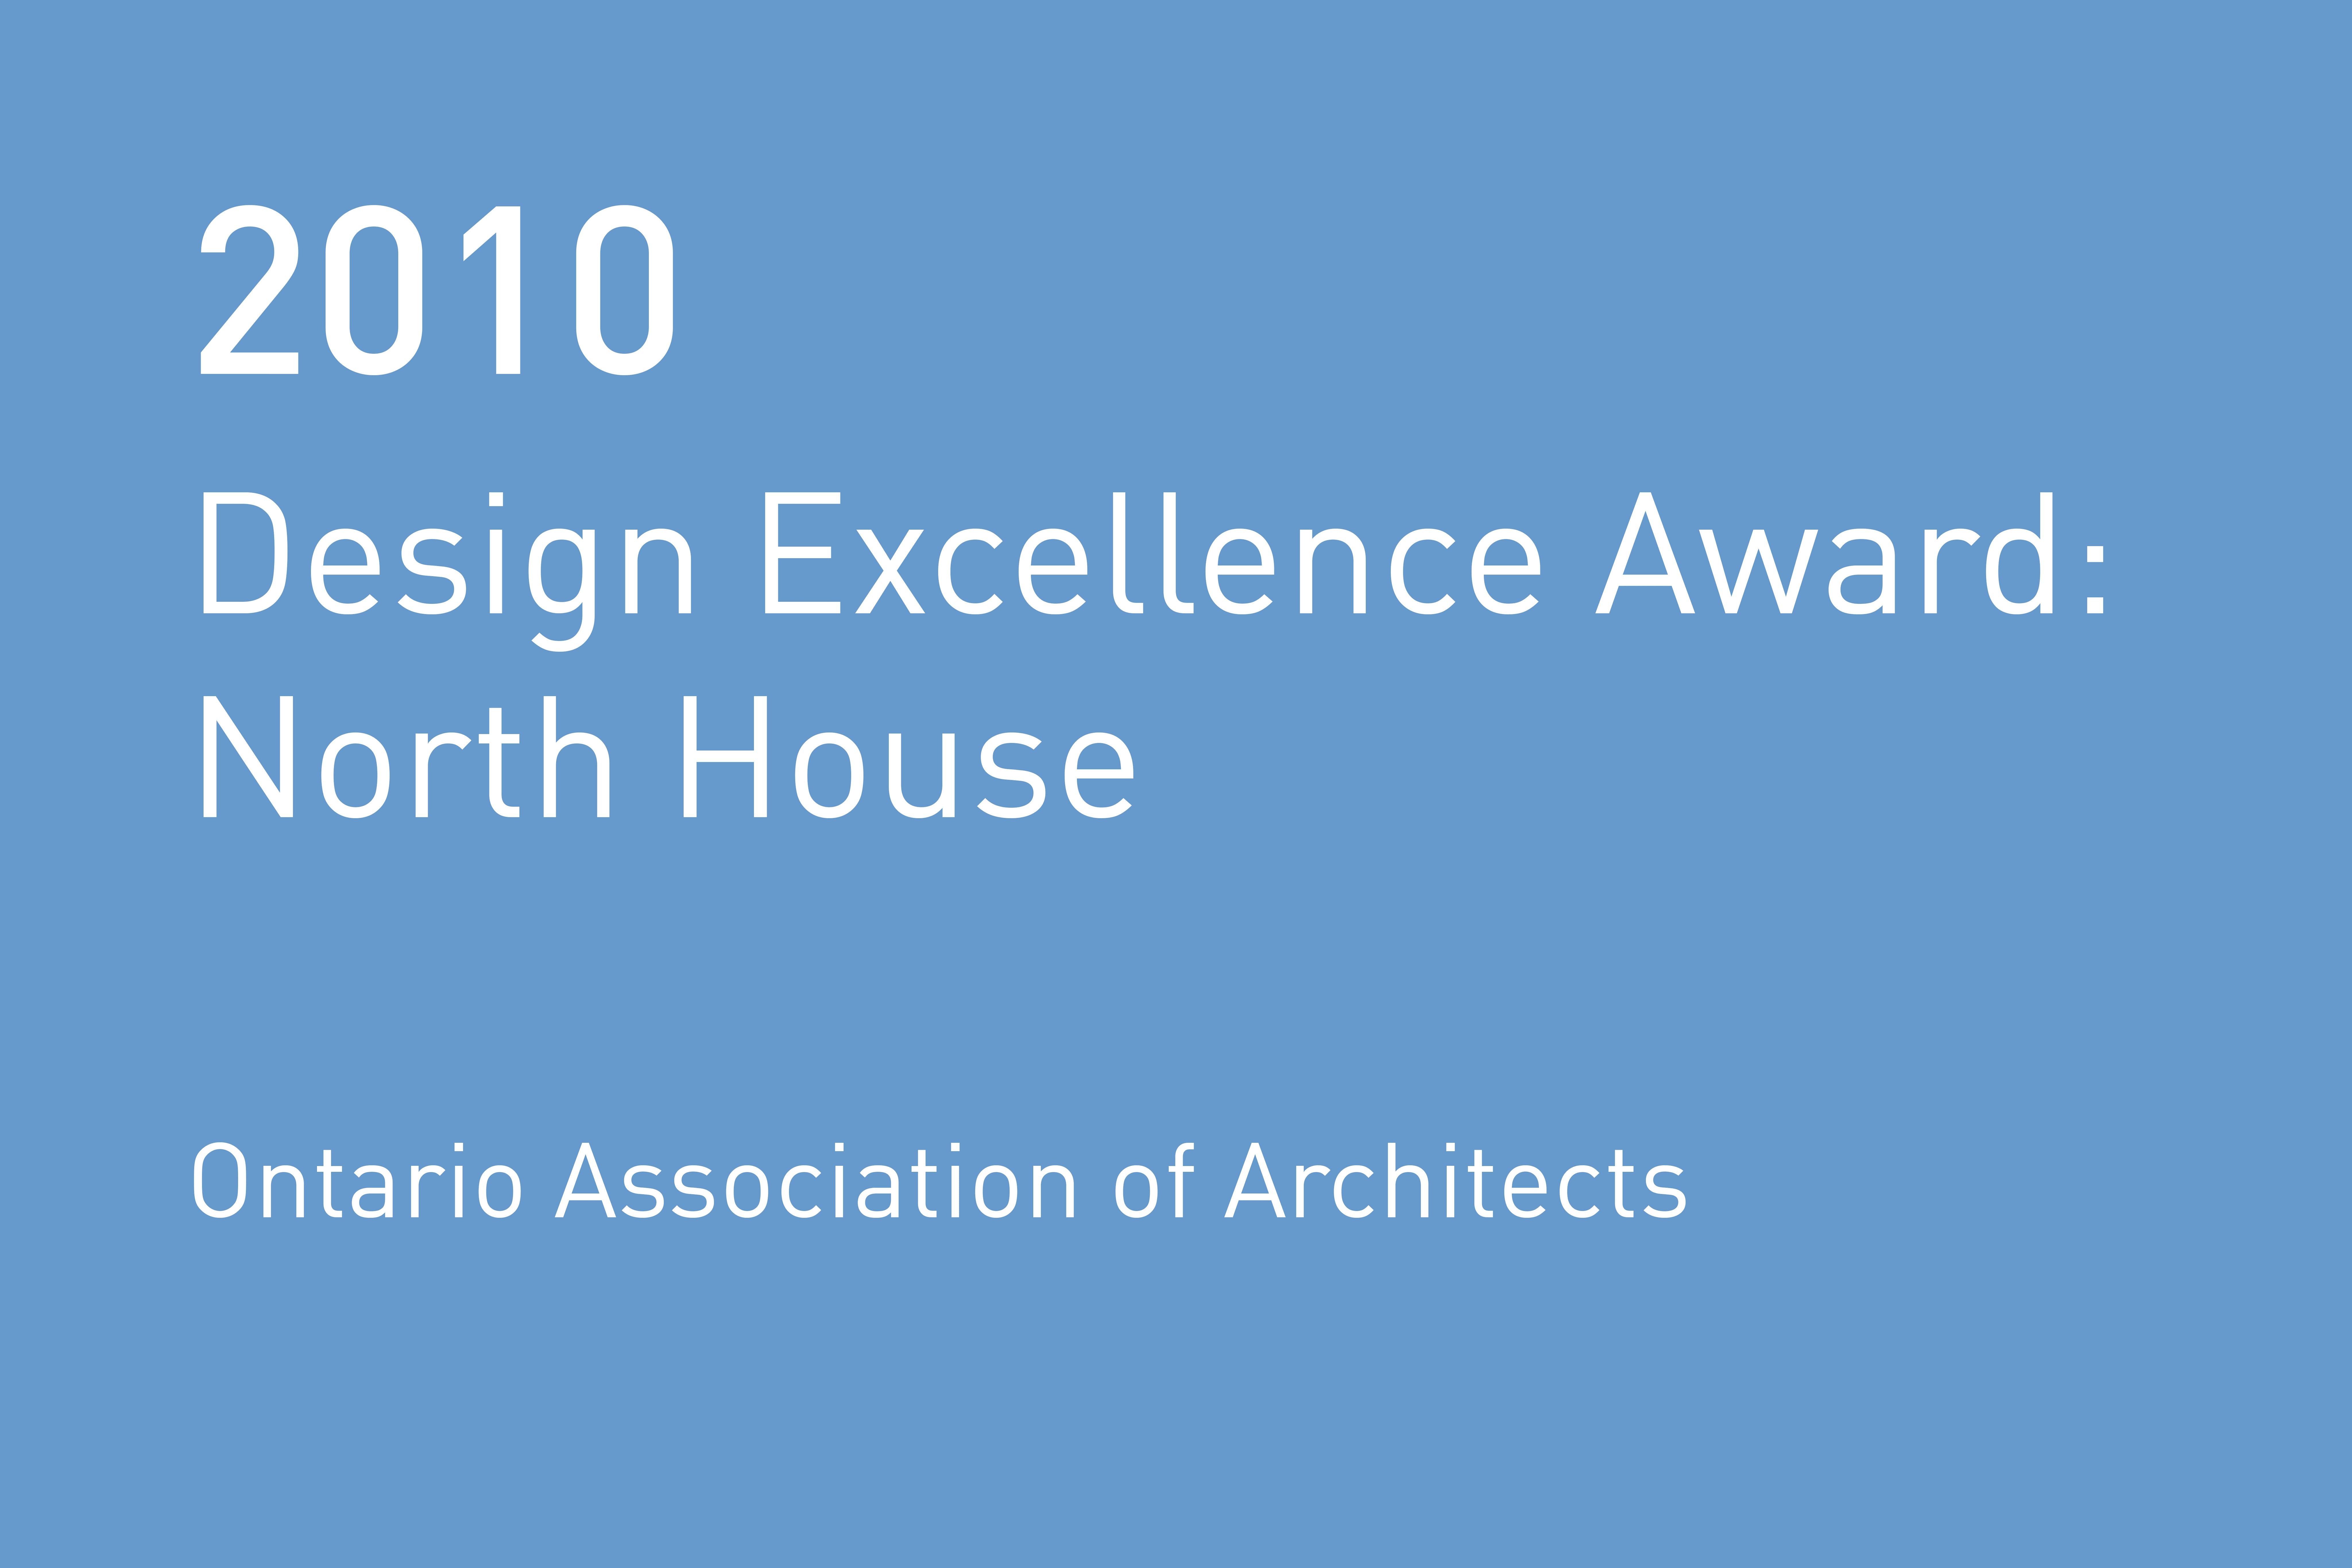 Rvtr 2010 ontario assoc architects